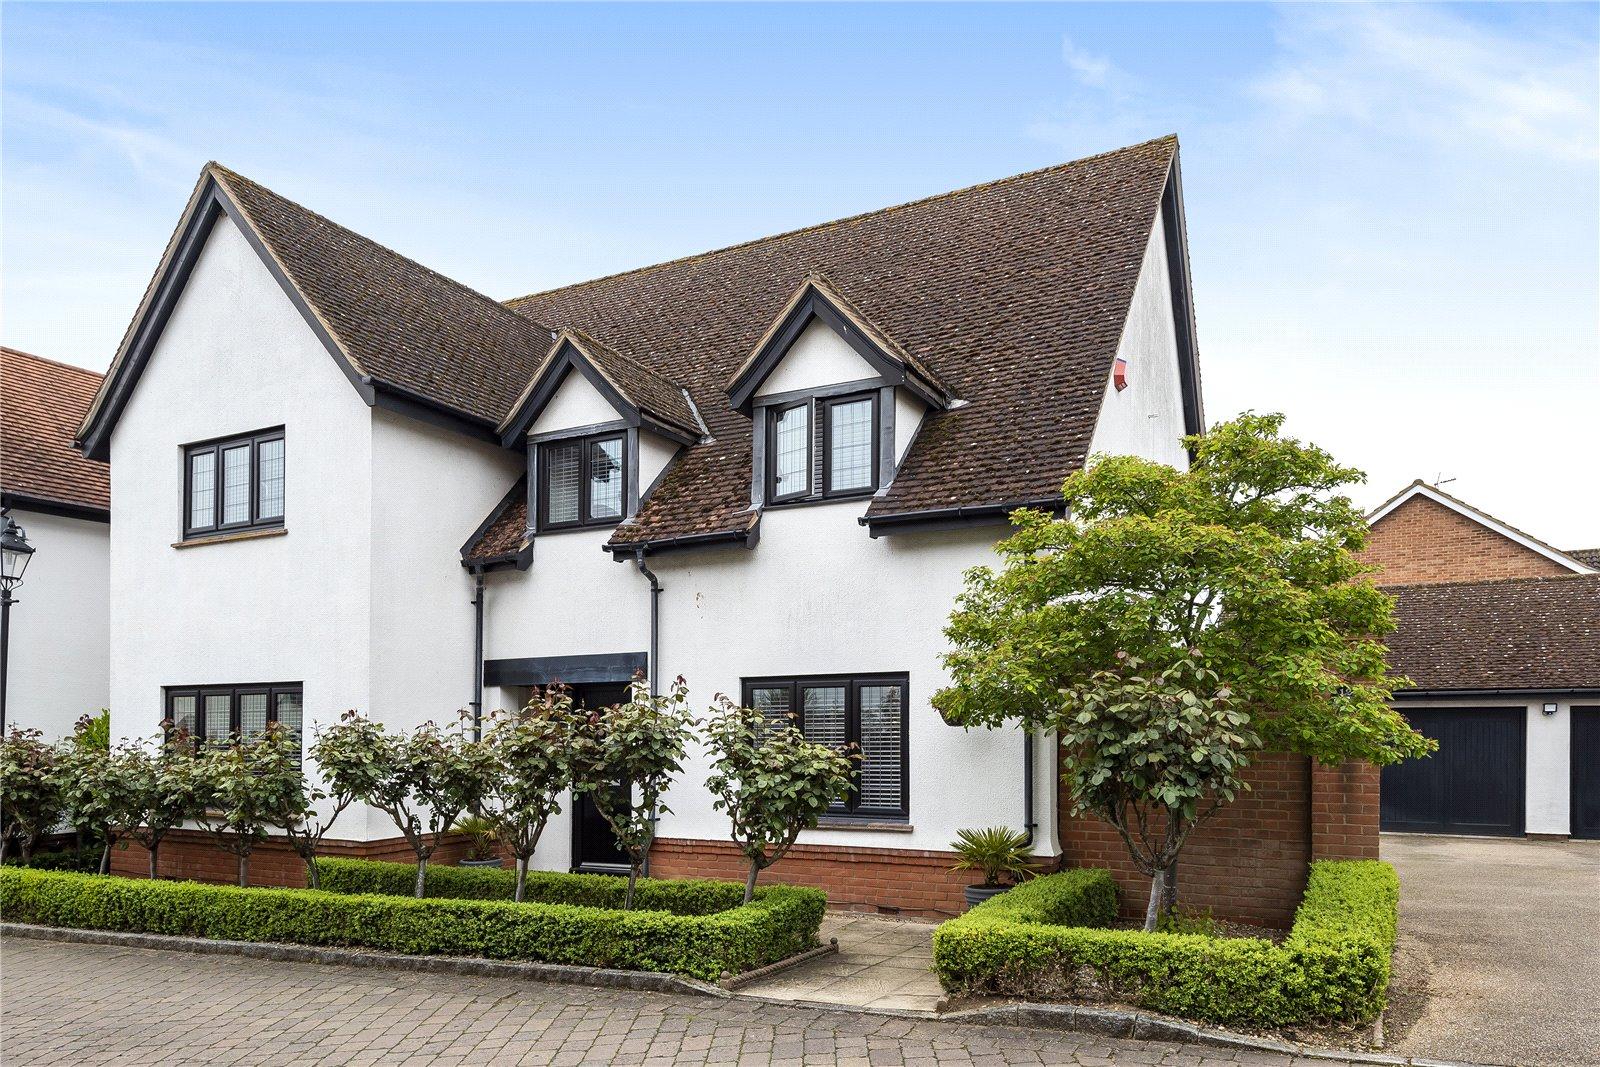 four bedroom detached home in Silsoe Bedfordshire